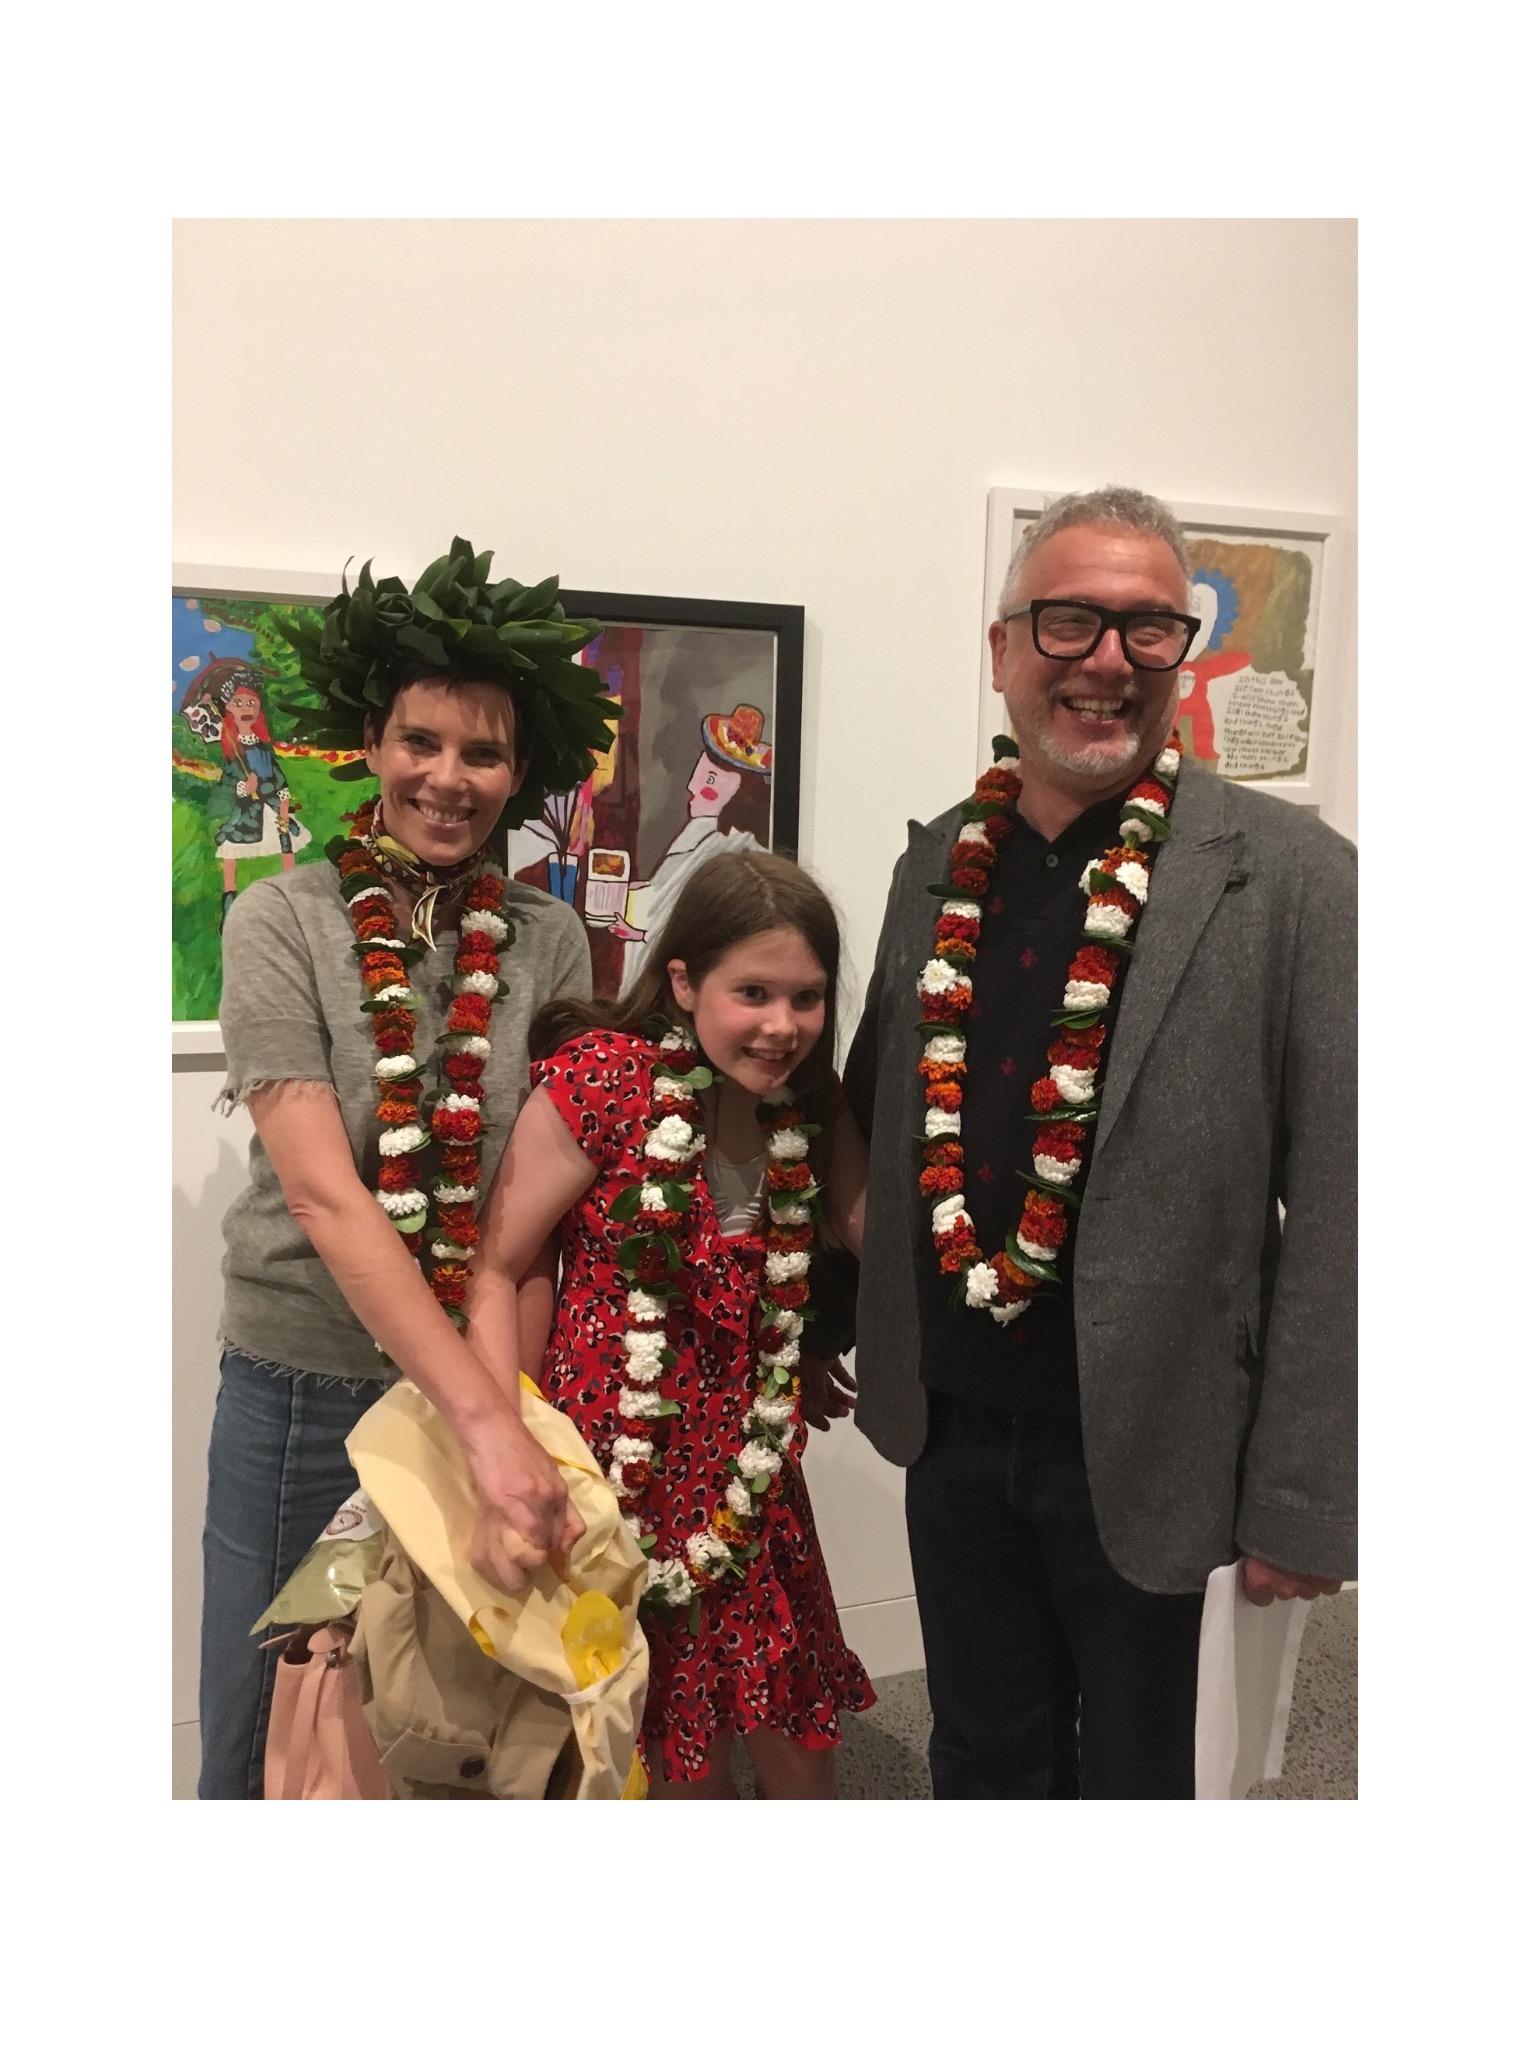 Karen Walker, Mikhail Gherman and their daughter Valentina.